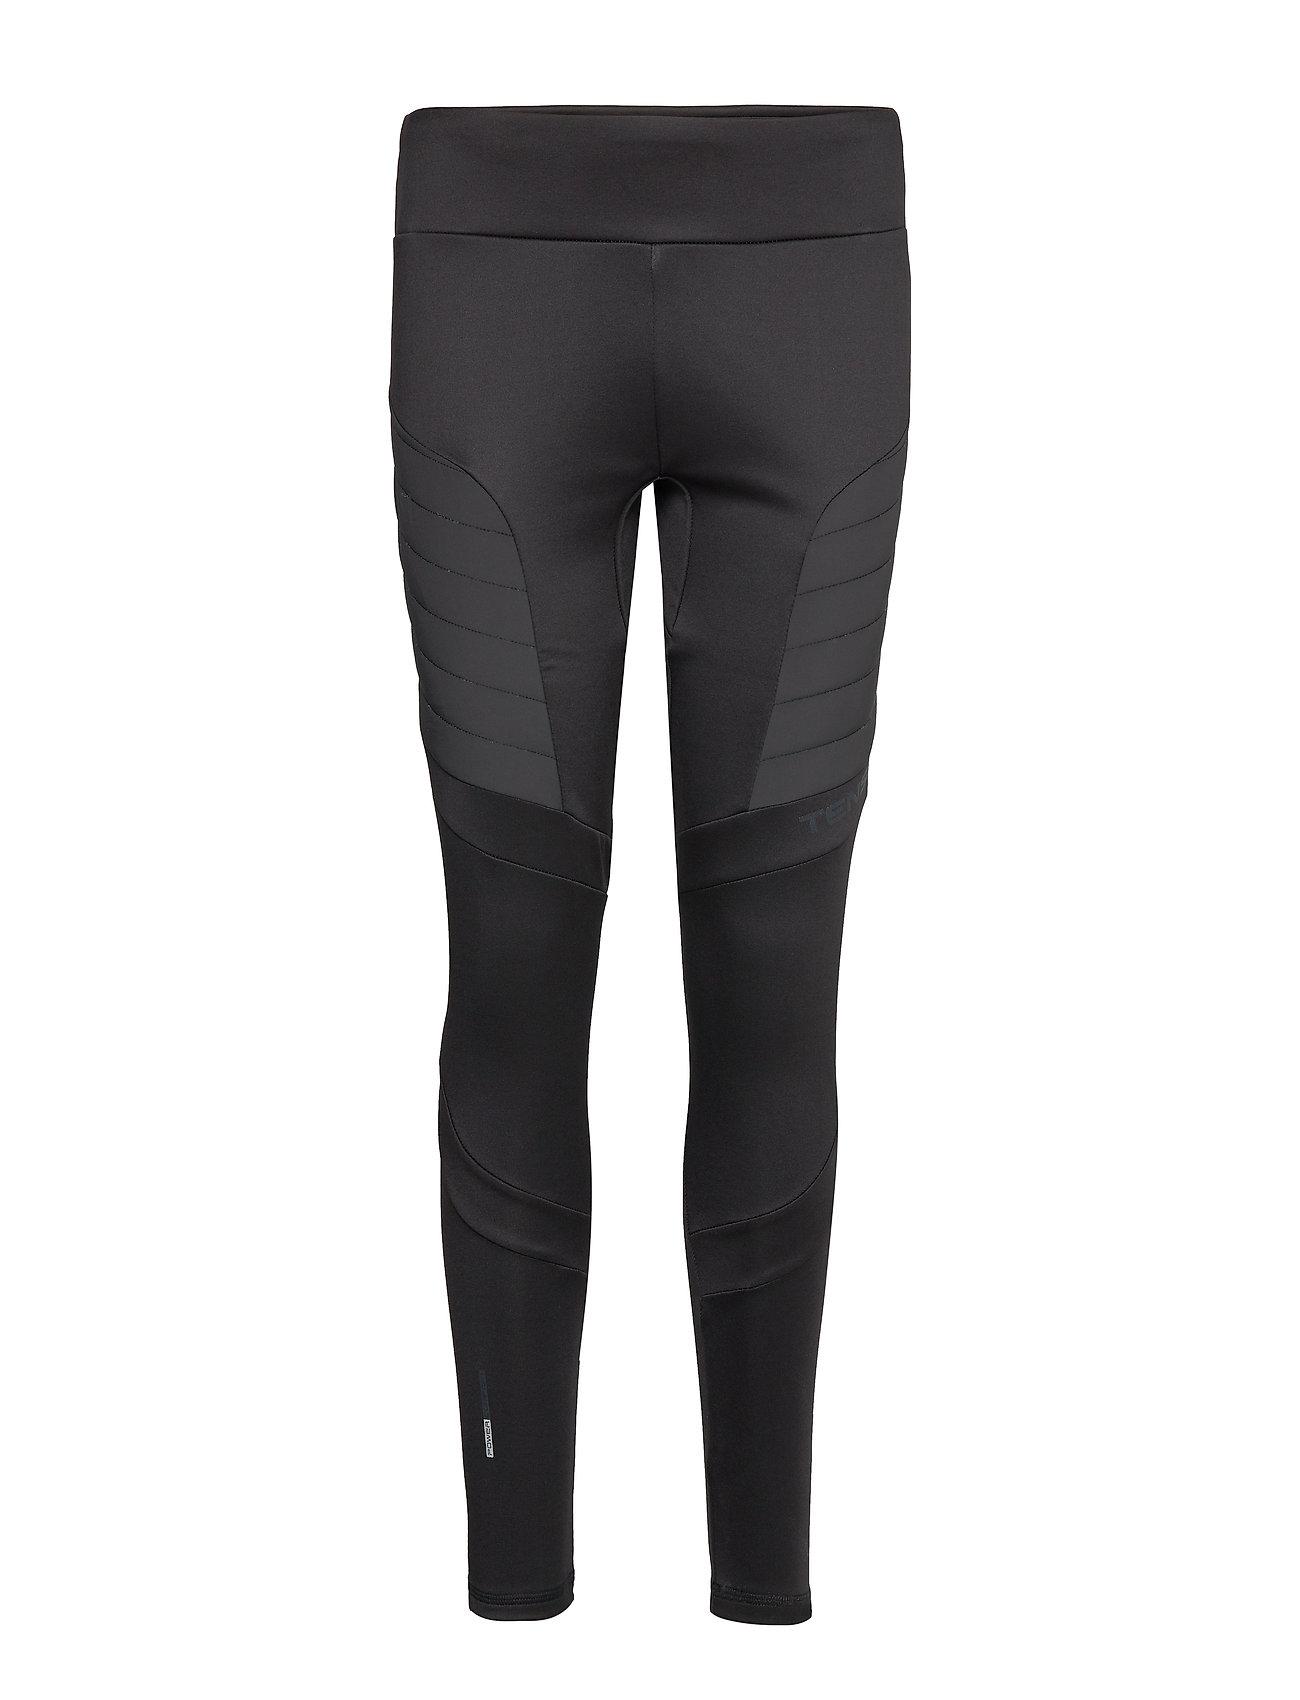 Tenson Therma Pants - BLACK